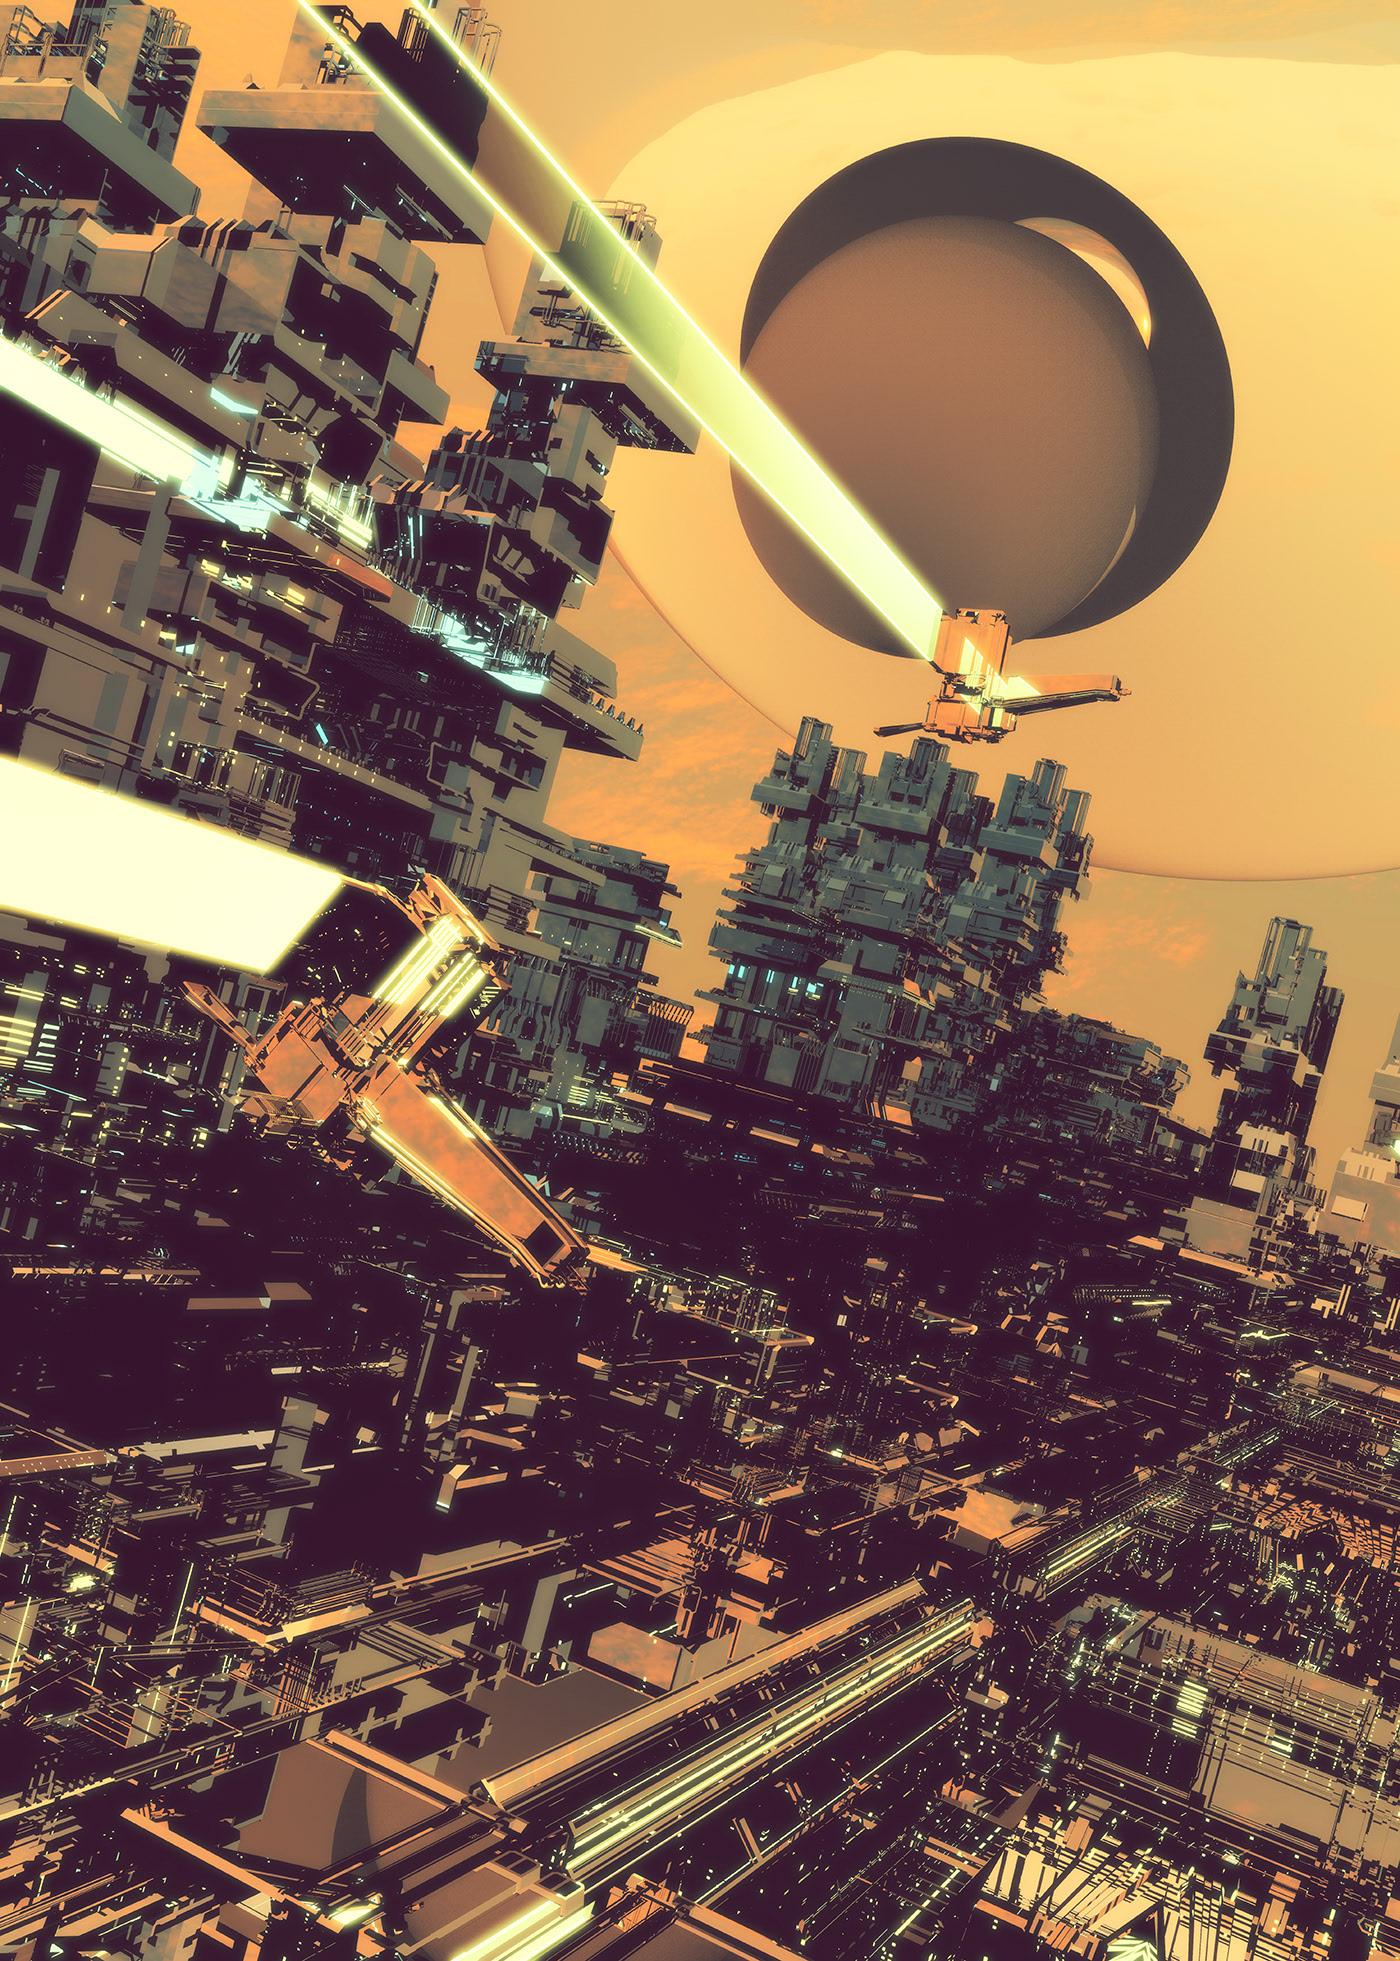 Futuristic Digital Art by atelier olschinsky